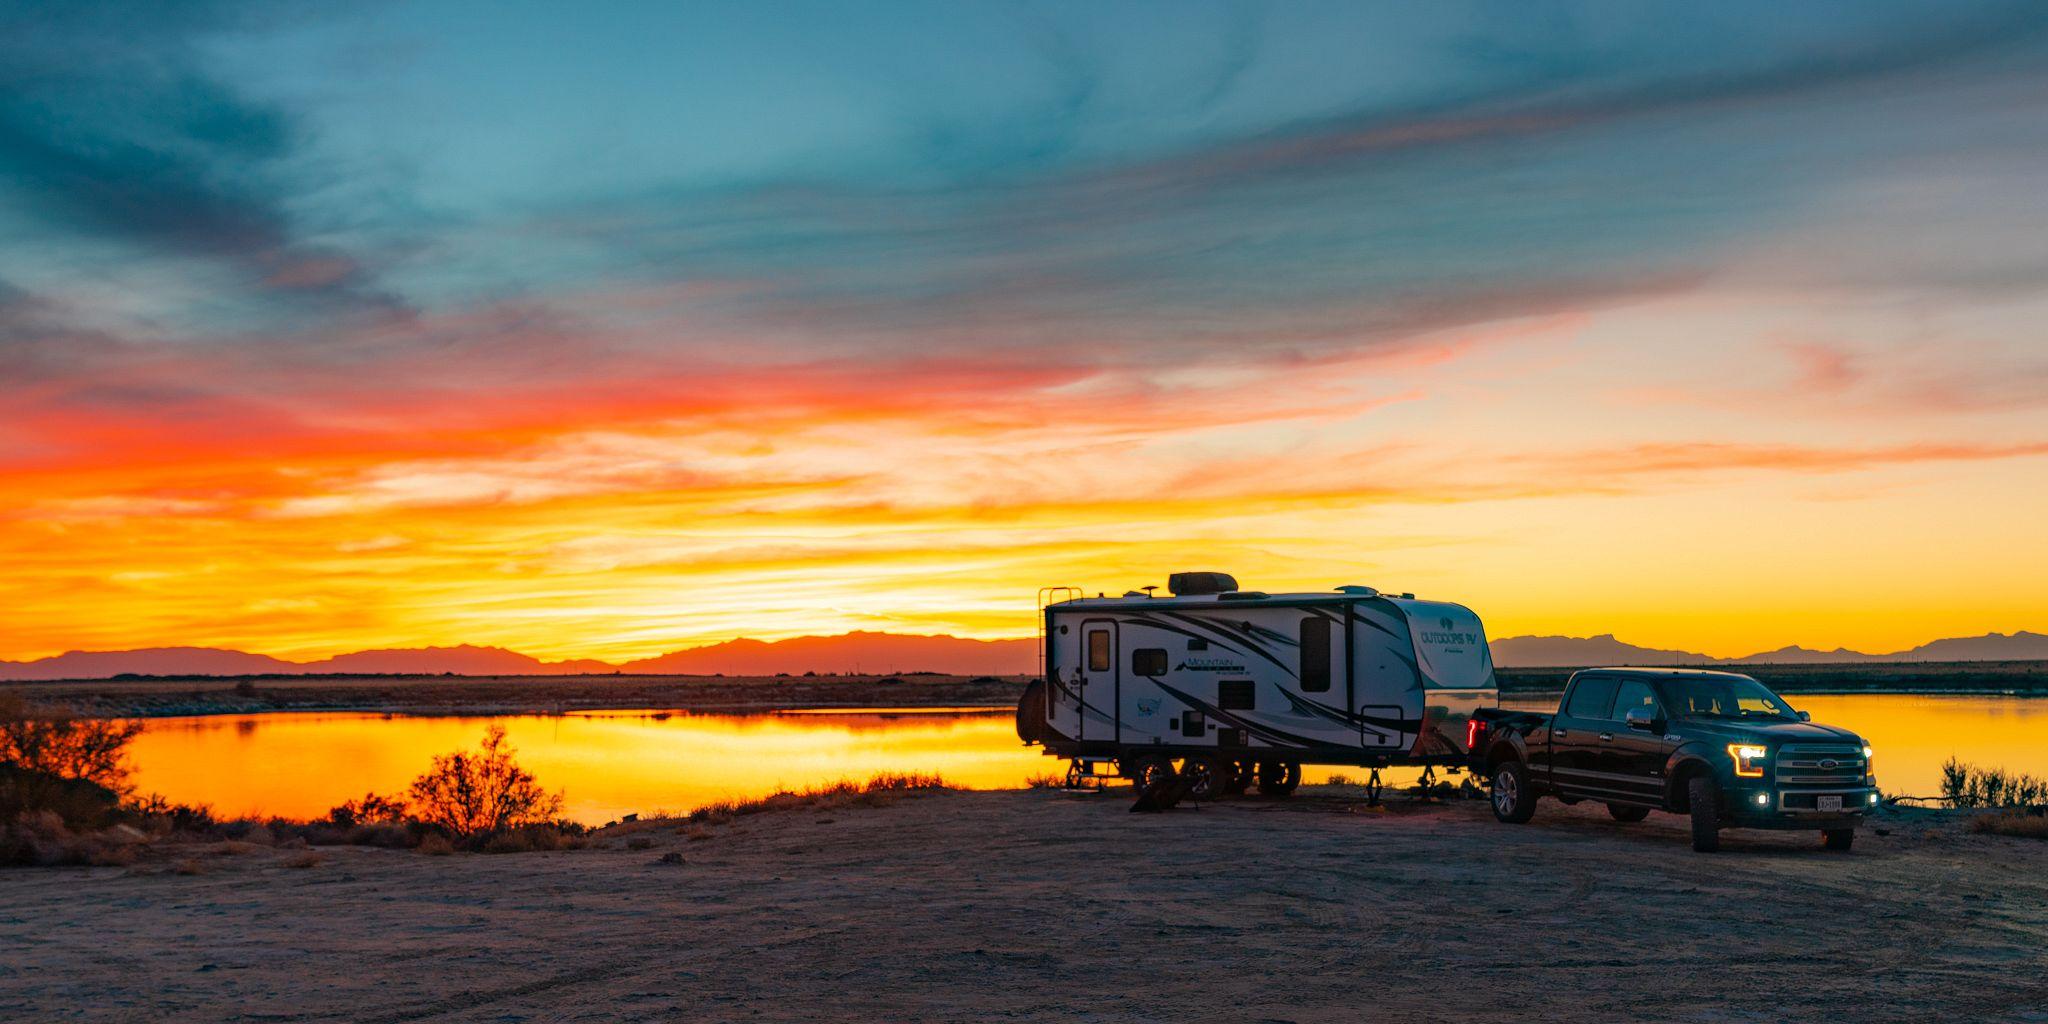 Sunset at Lake Holloman